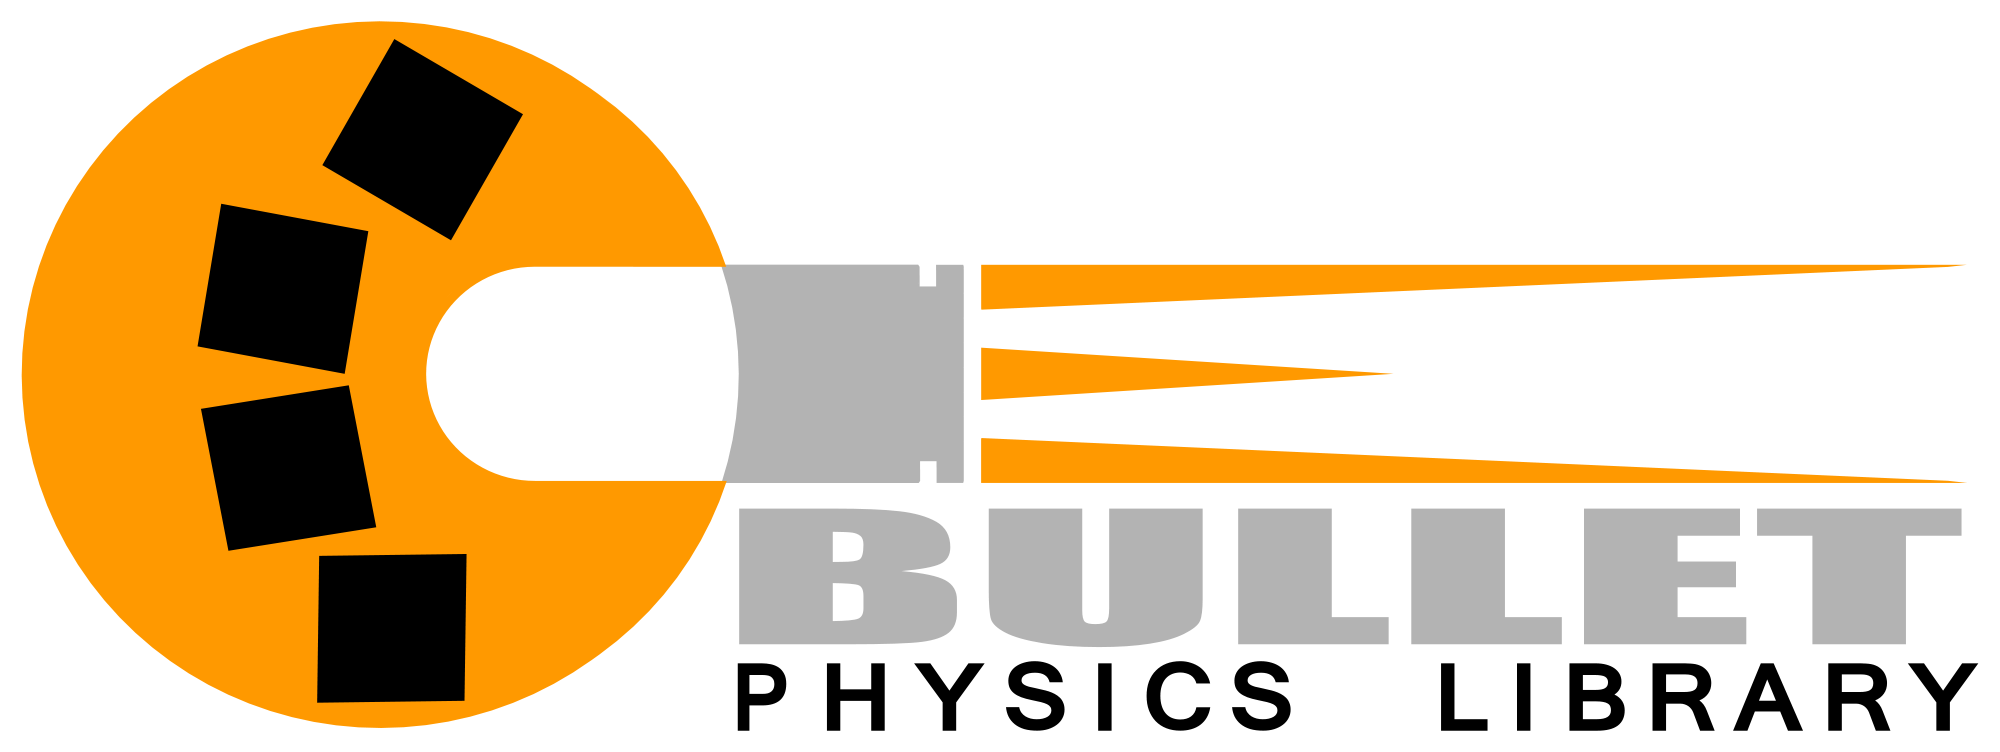 Bullet svg #8, Download drawings